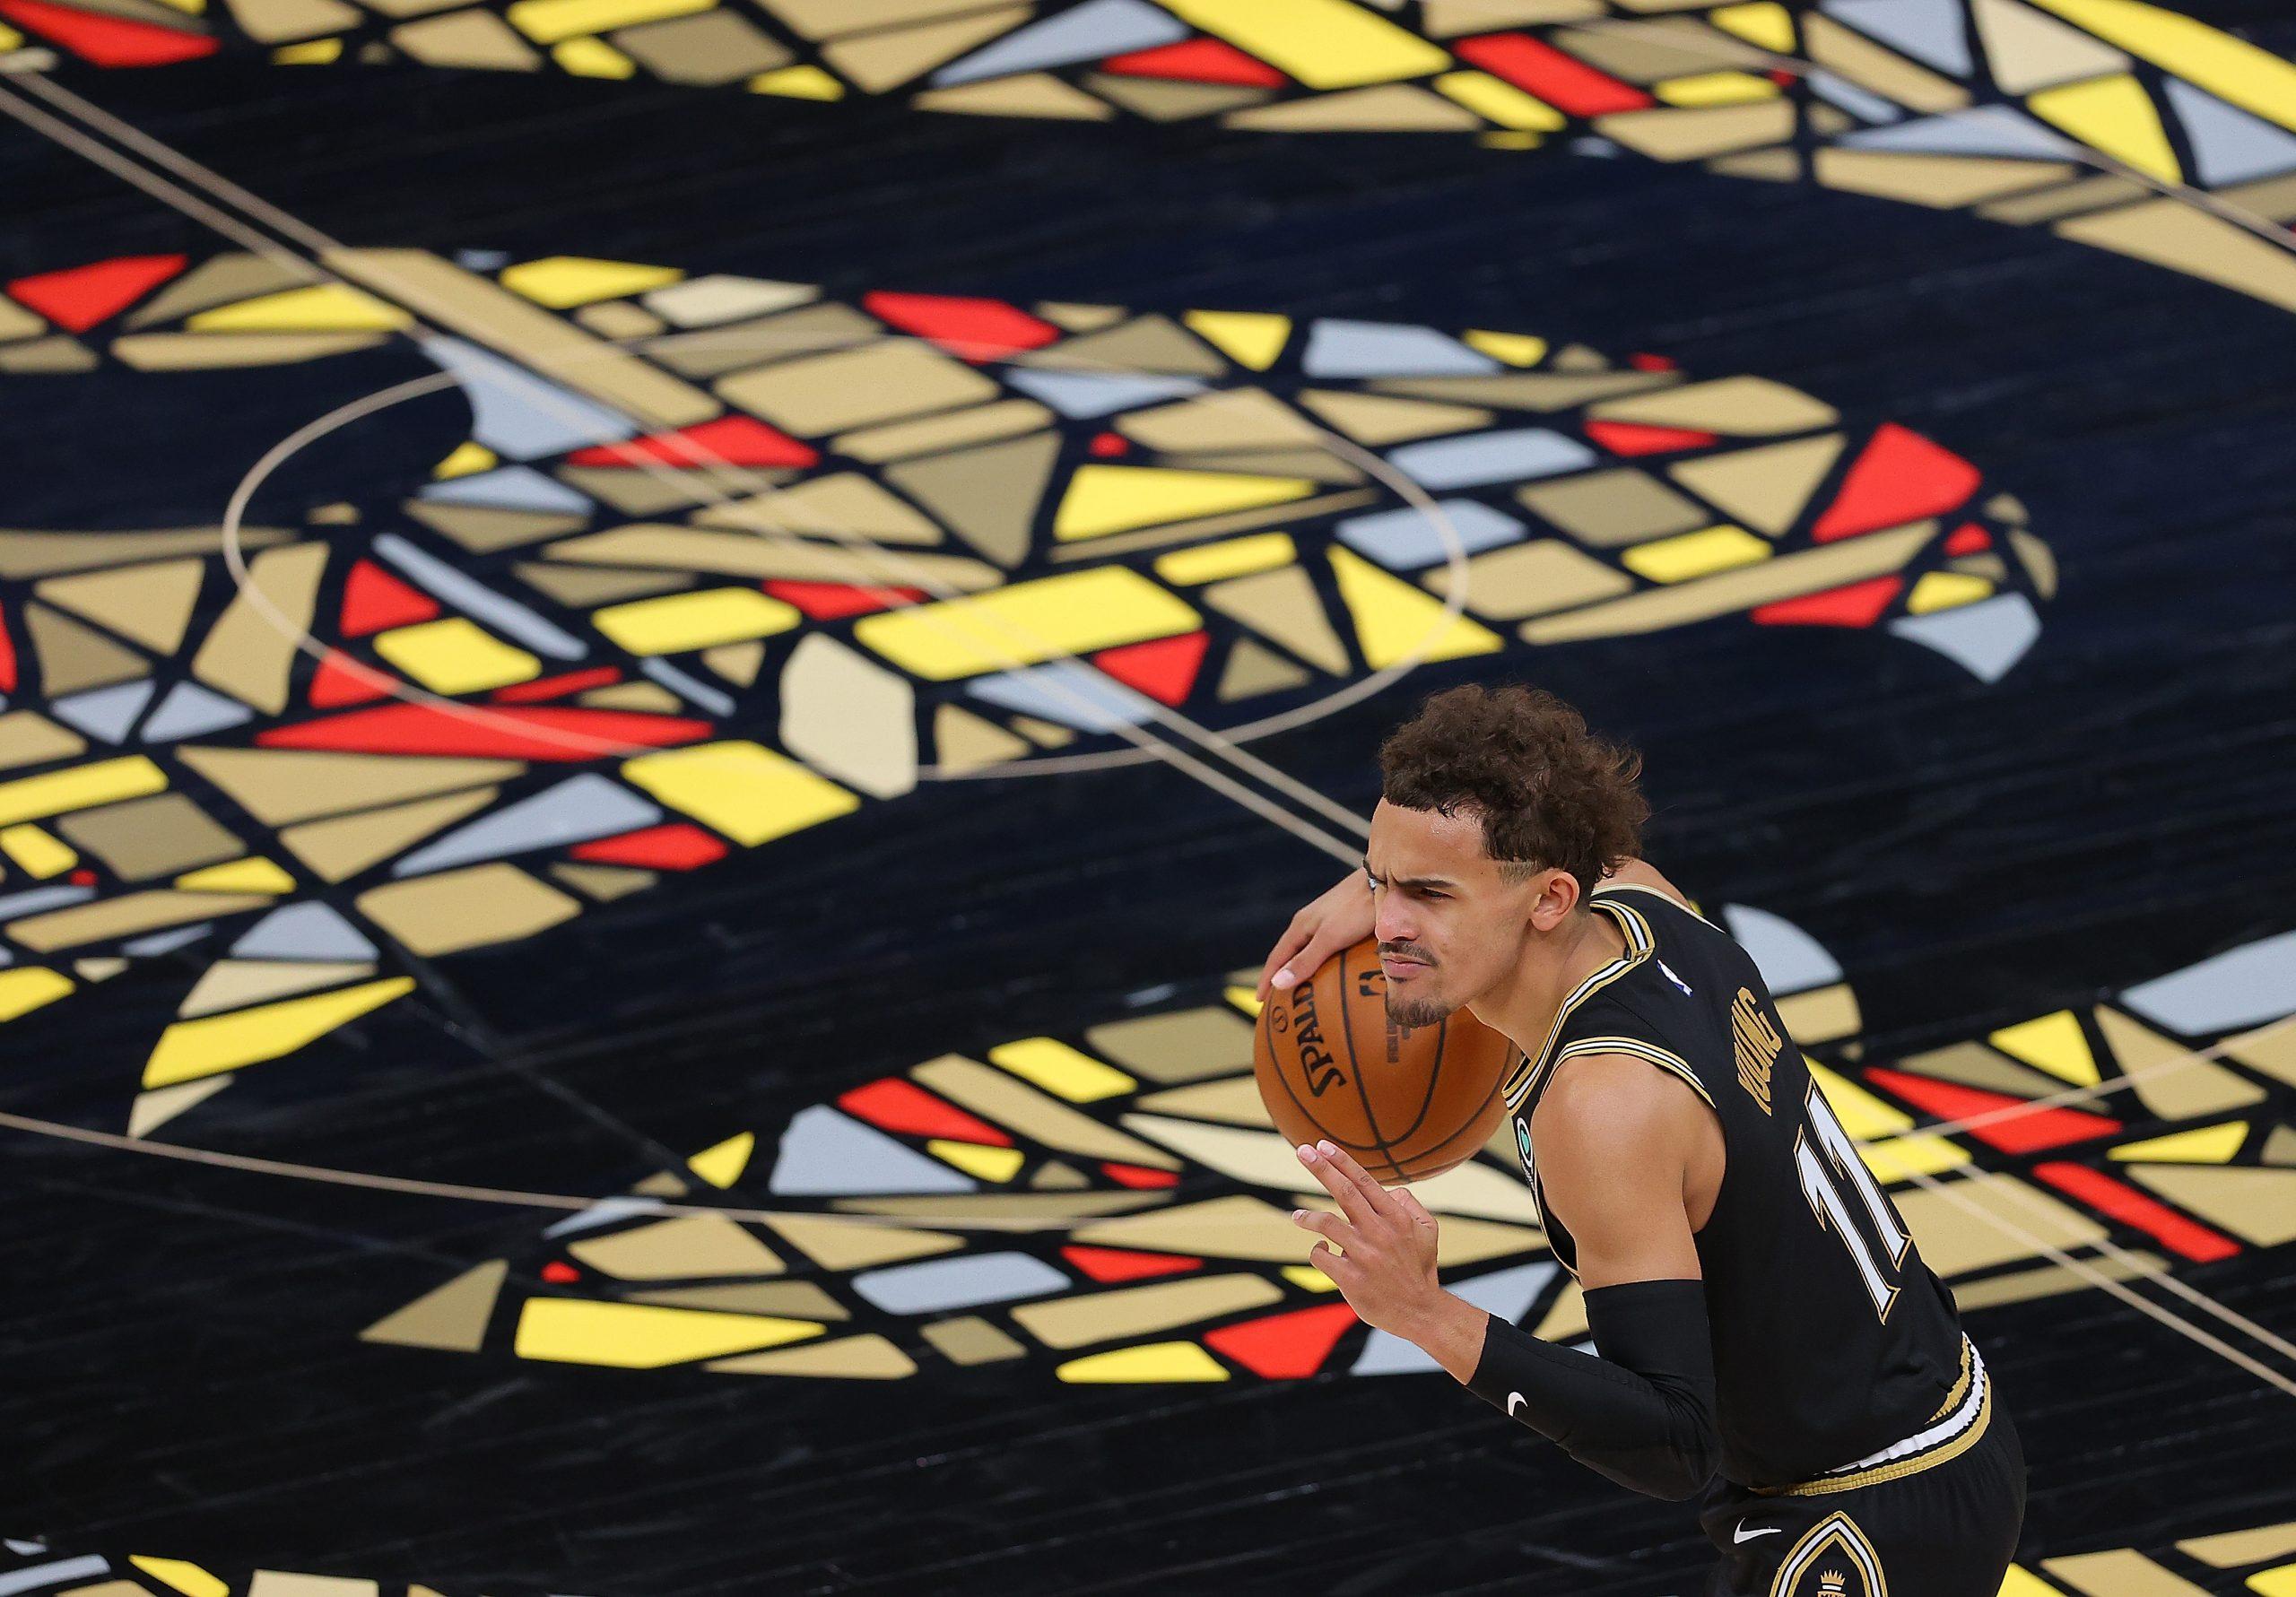 Westbrook dogonił Oscara Robertsona, pojedynek strzelecki Curry vs Beal, powrót Nets